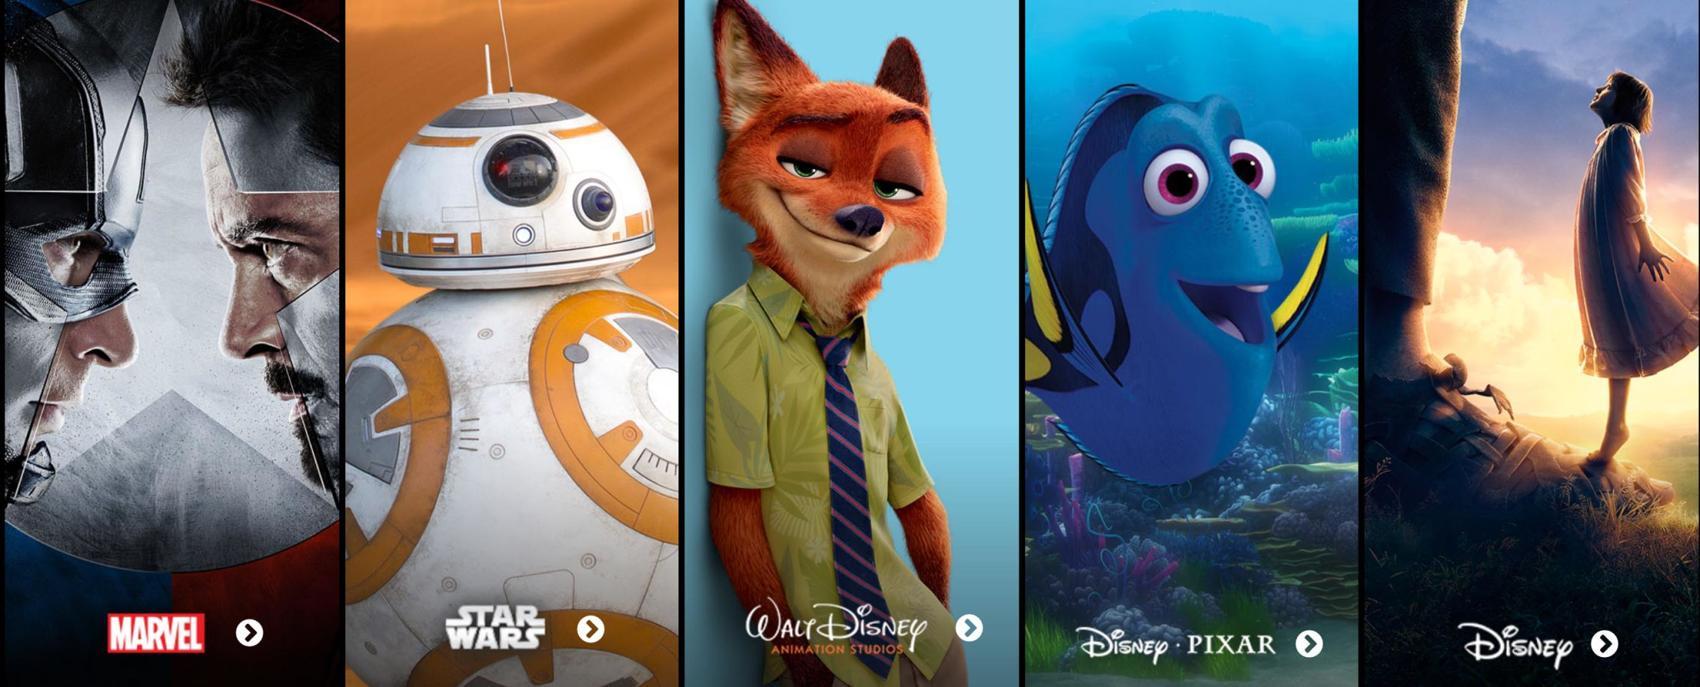 Animowane postaci